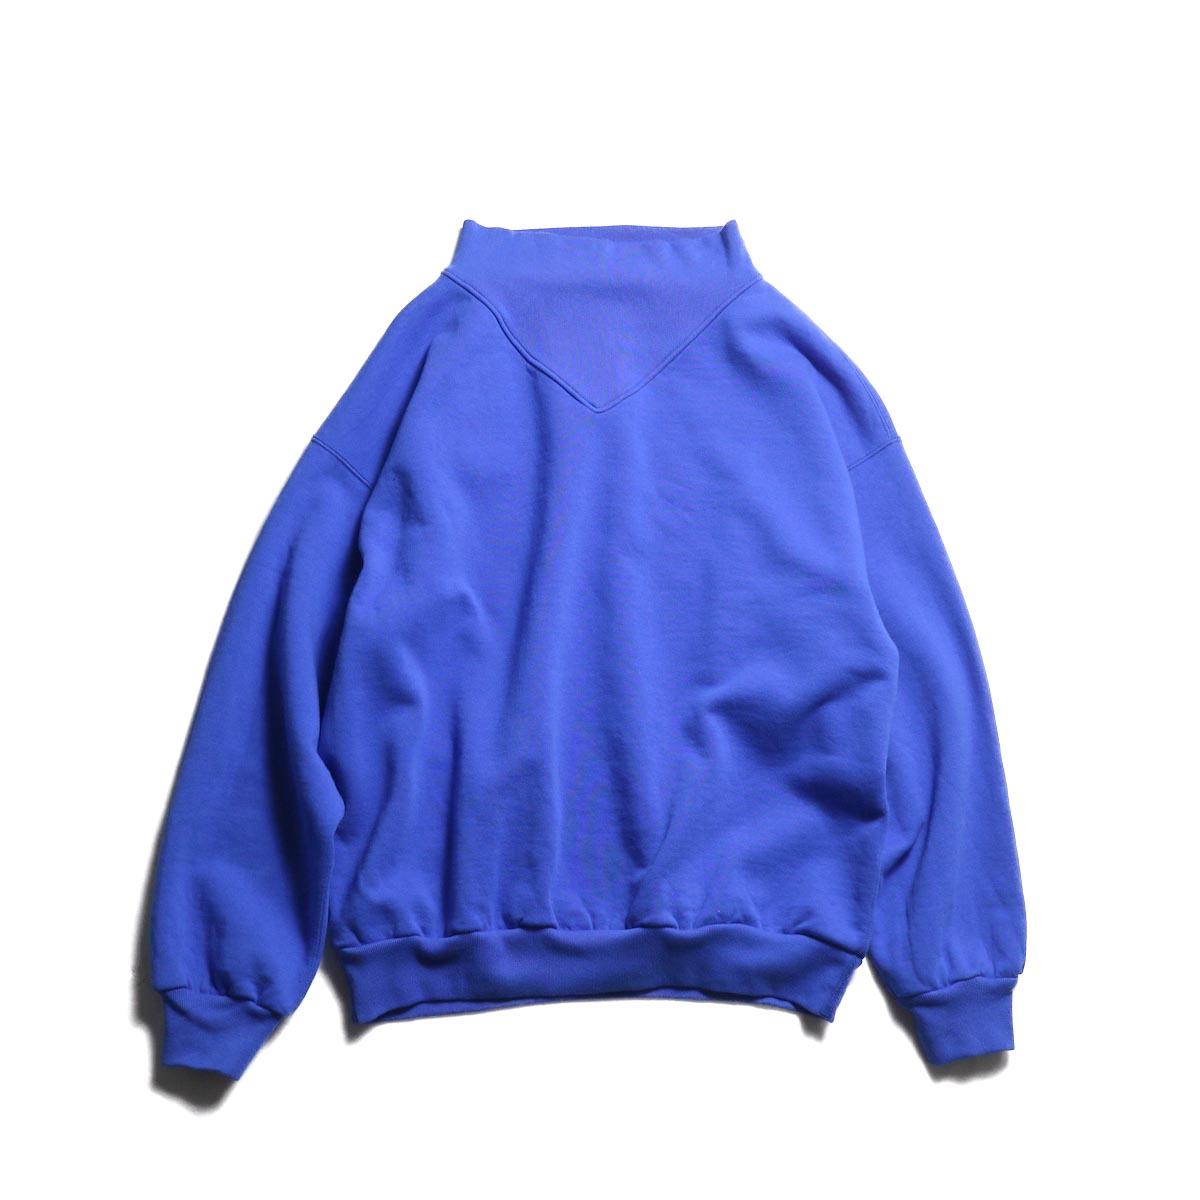 UNUSED / US1679 crew neck sweat shirt / women's. -Blue